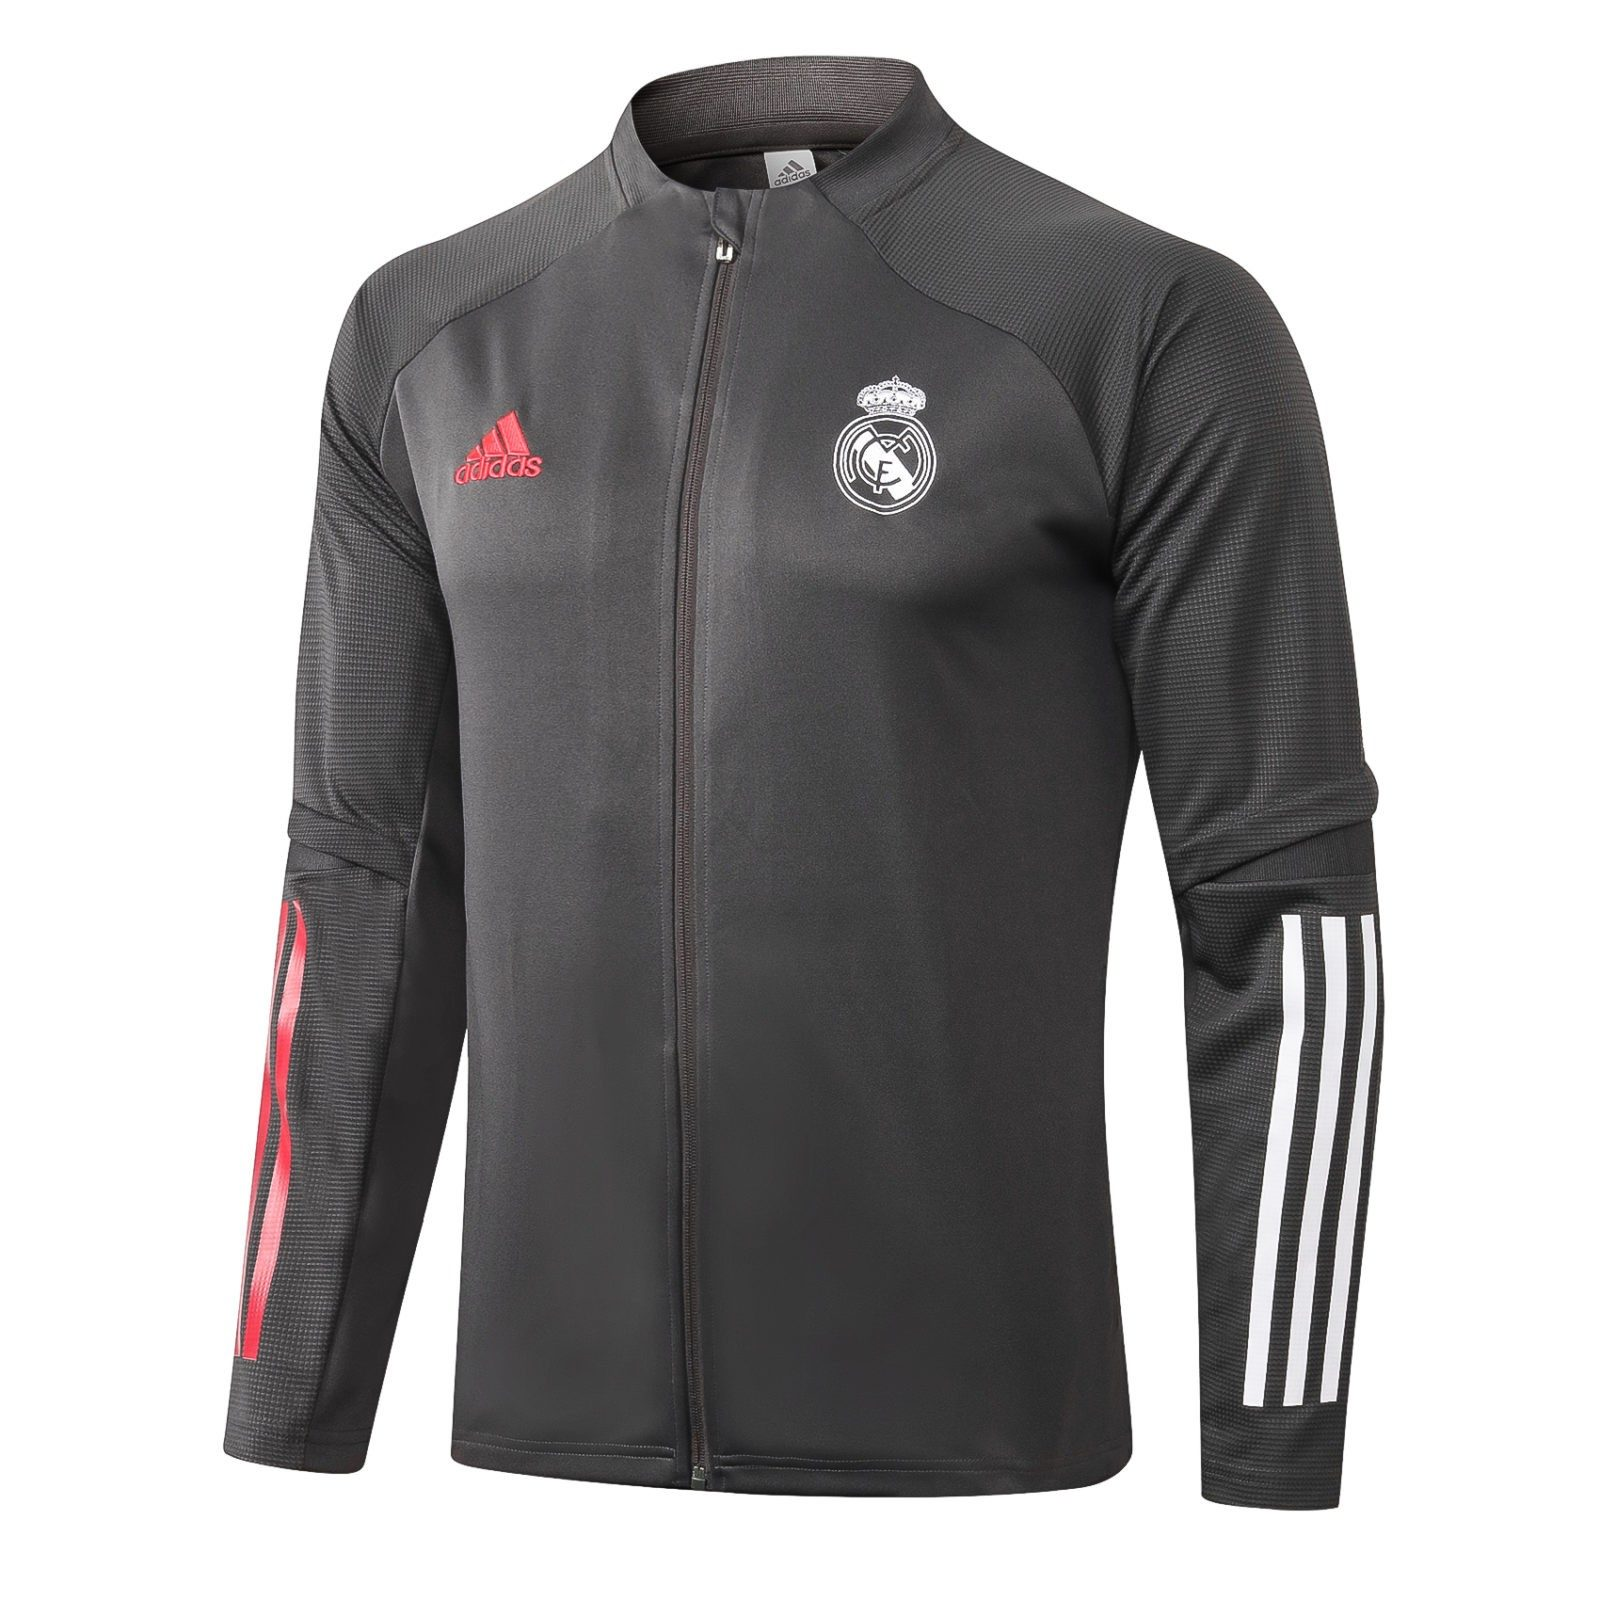 Олимпийка Реал Мадрид сезон 2020-2021 (Черная 2)